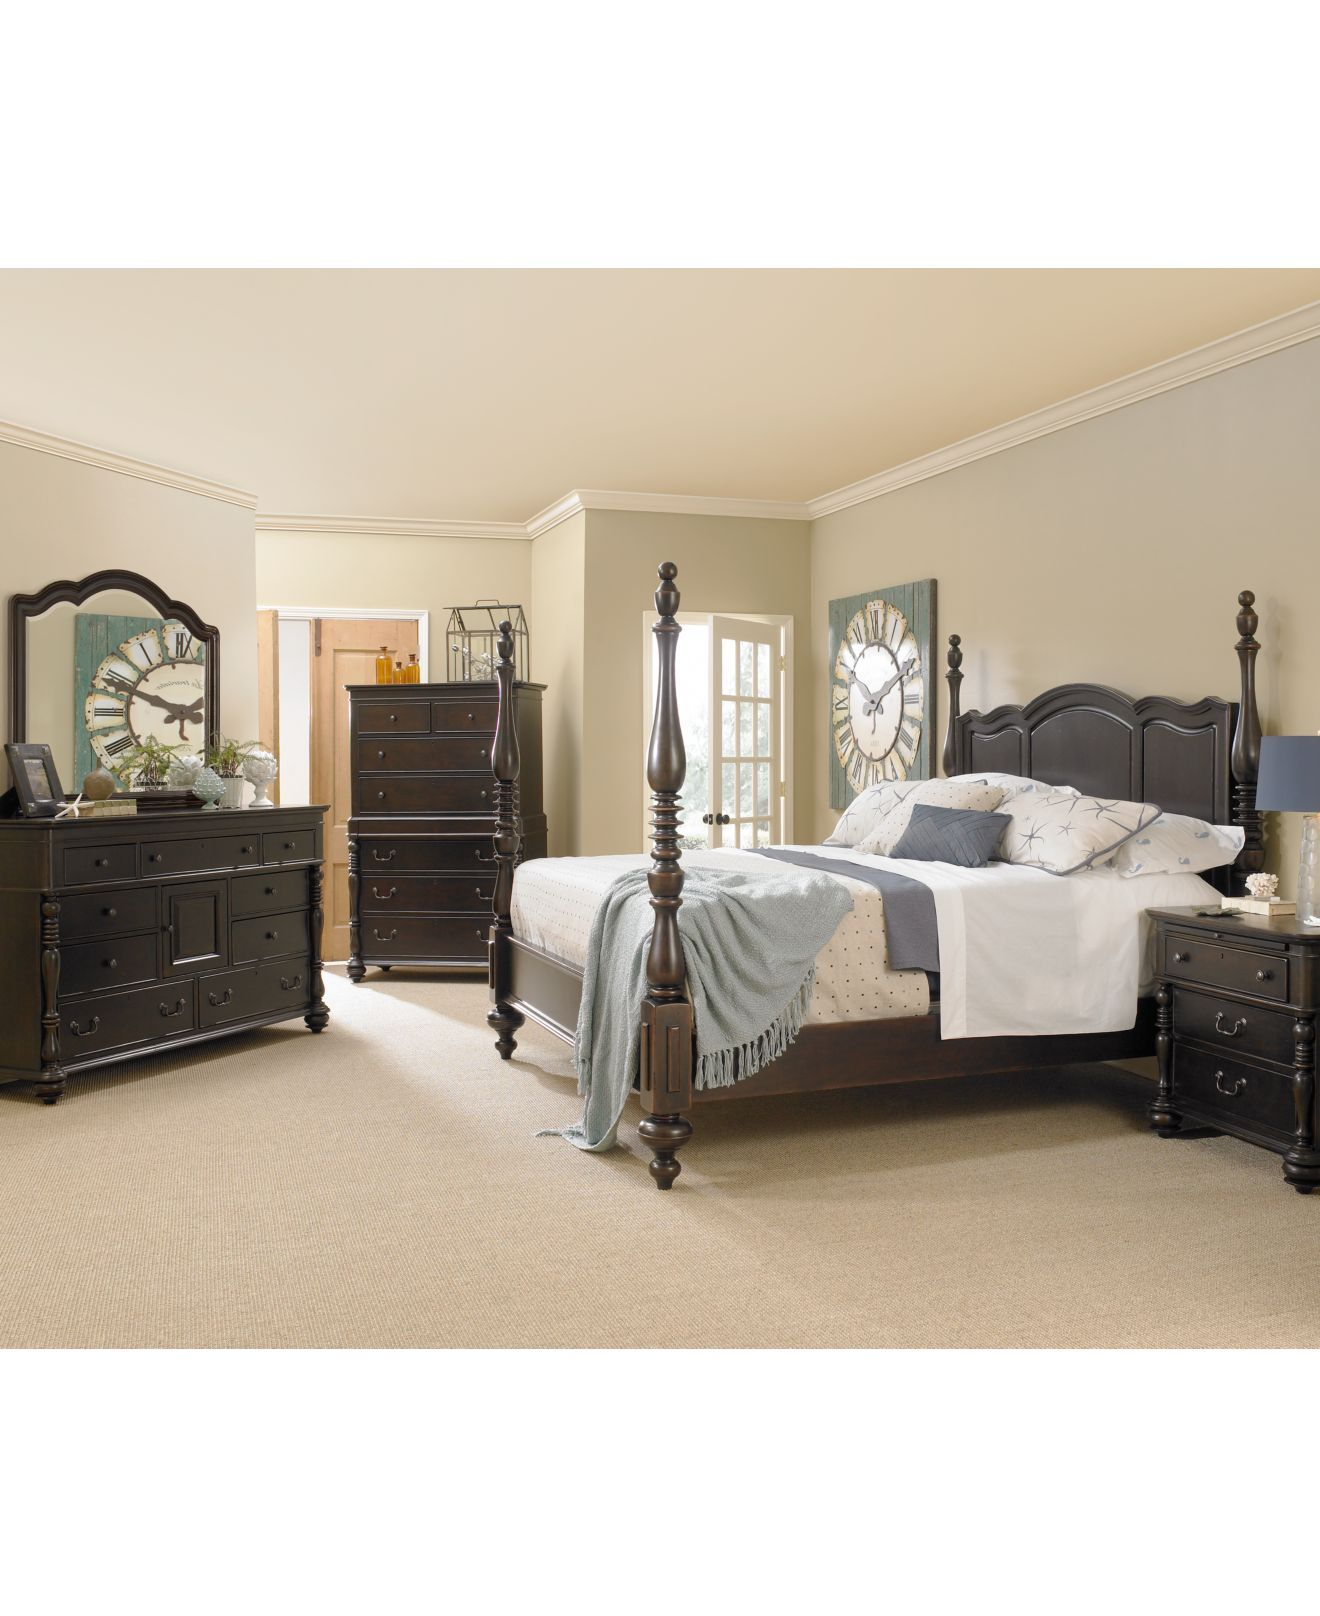 Paula Deen Bedroom Furniture Collection Savannah Buy